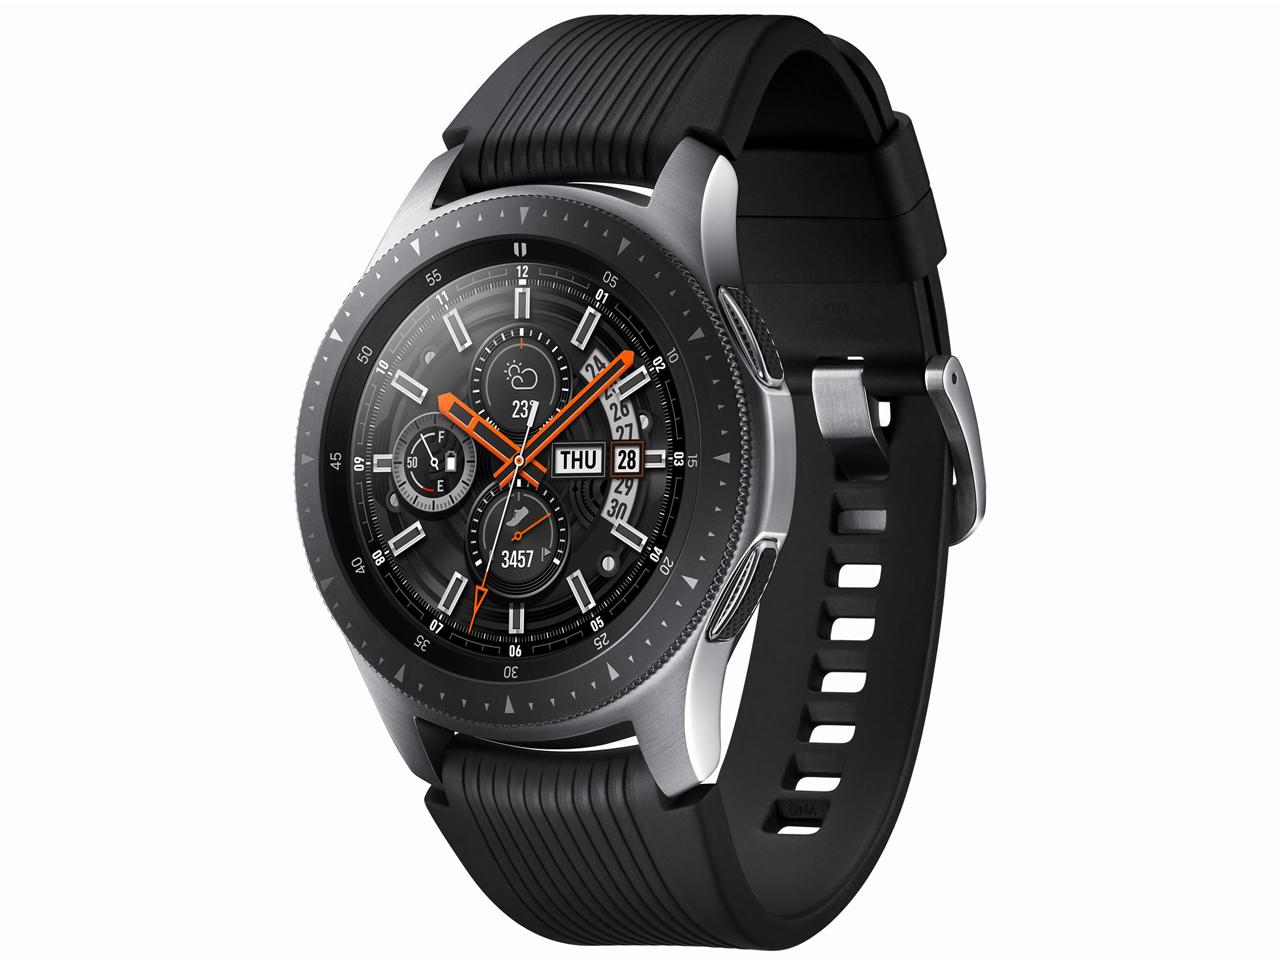 『本体1』 Galaxy Watch SM-R800NZSAXJP の製品画像